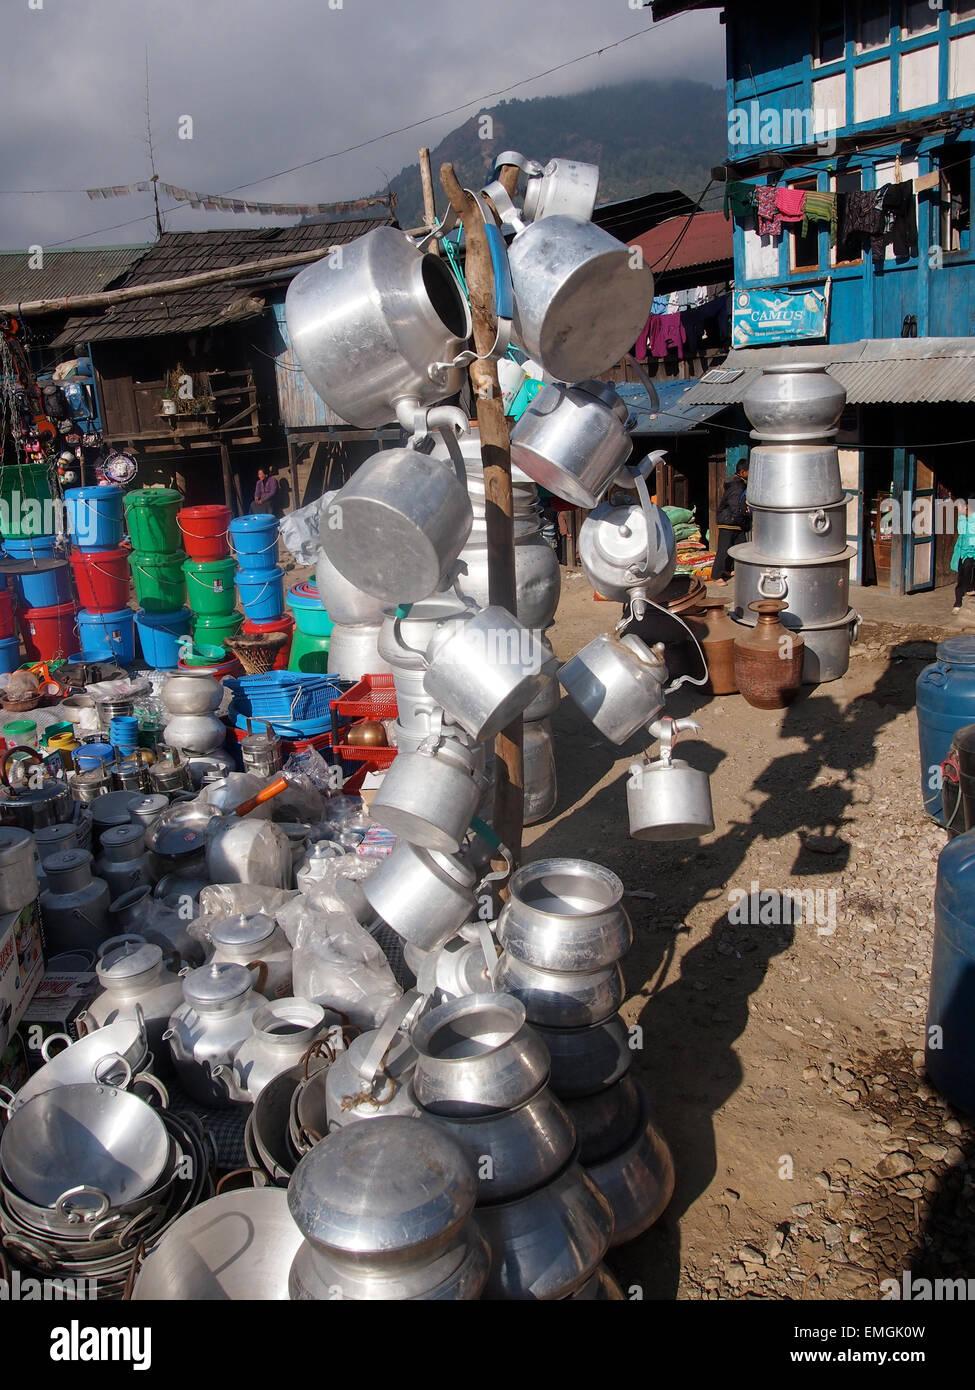 Pots Pans Kettles Market Village Buy Sell Lukla Nepal Asia - Stock Image